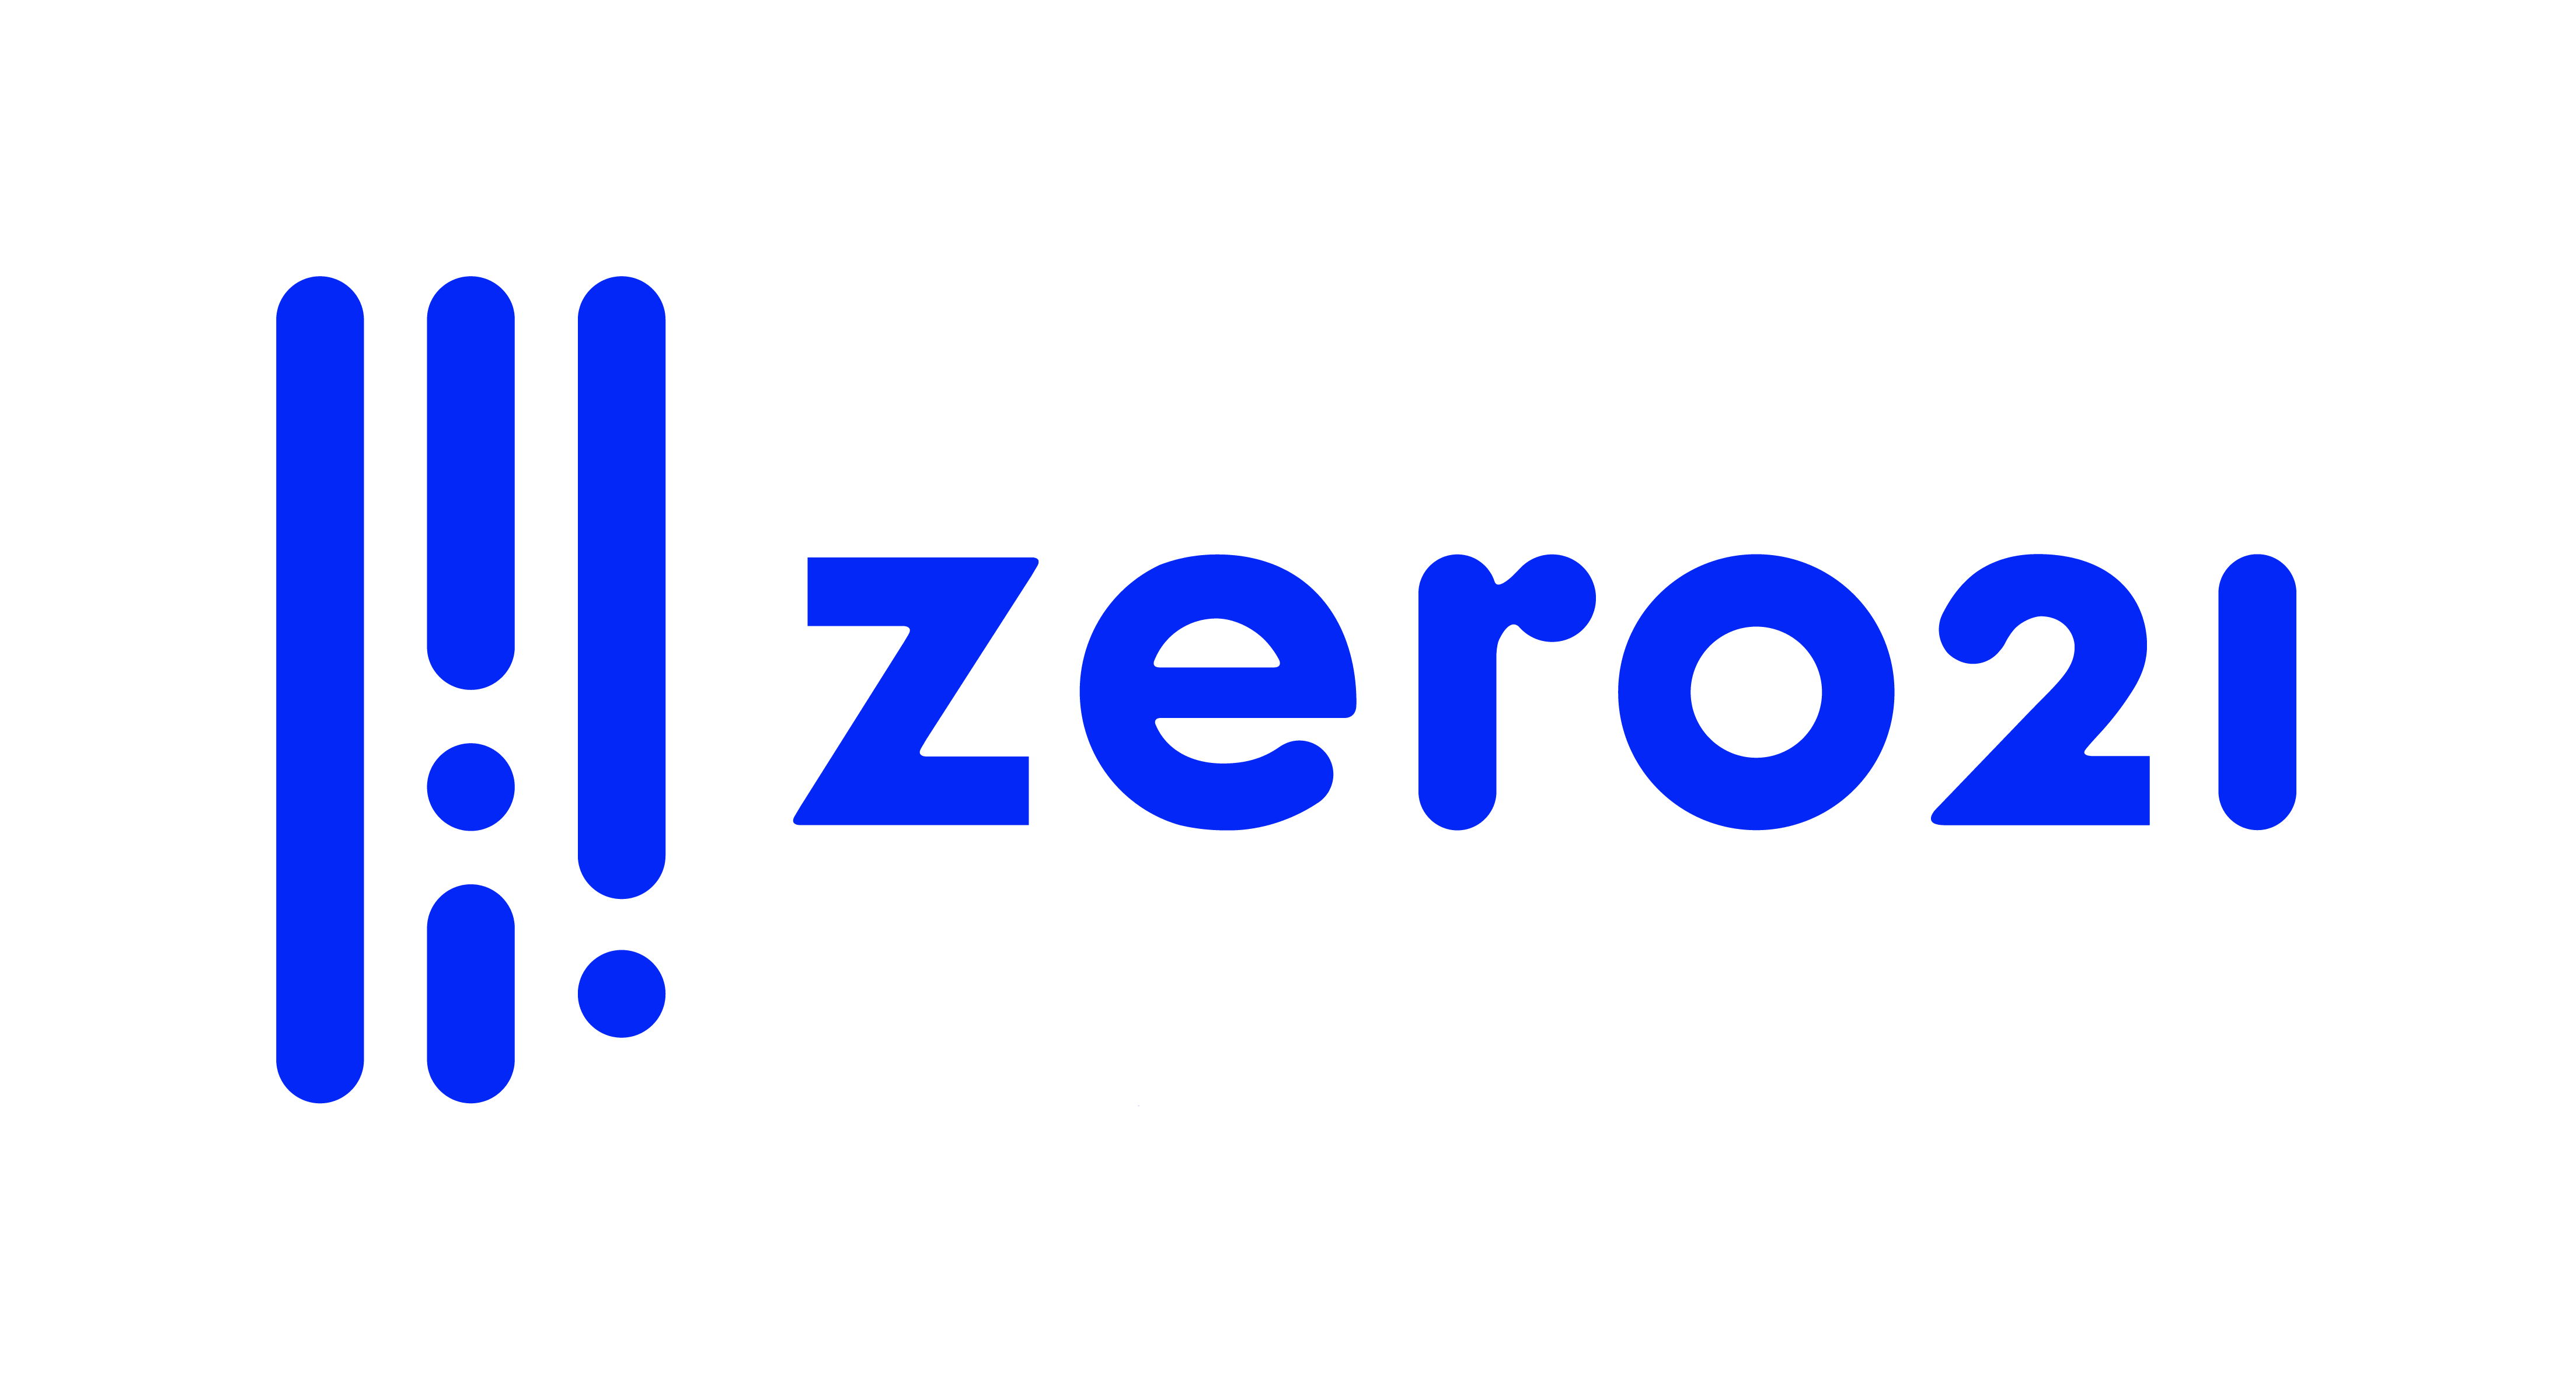 zero21 logo